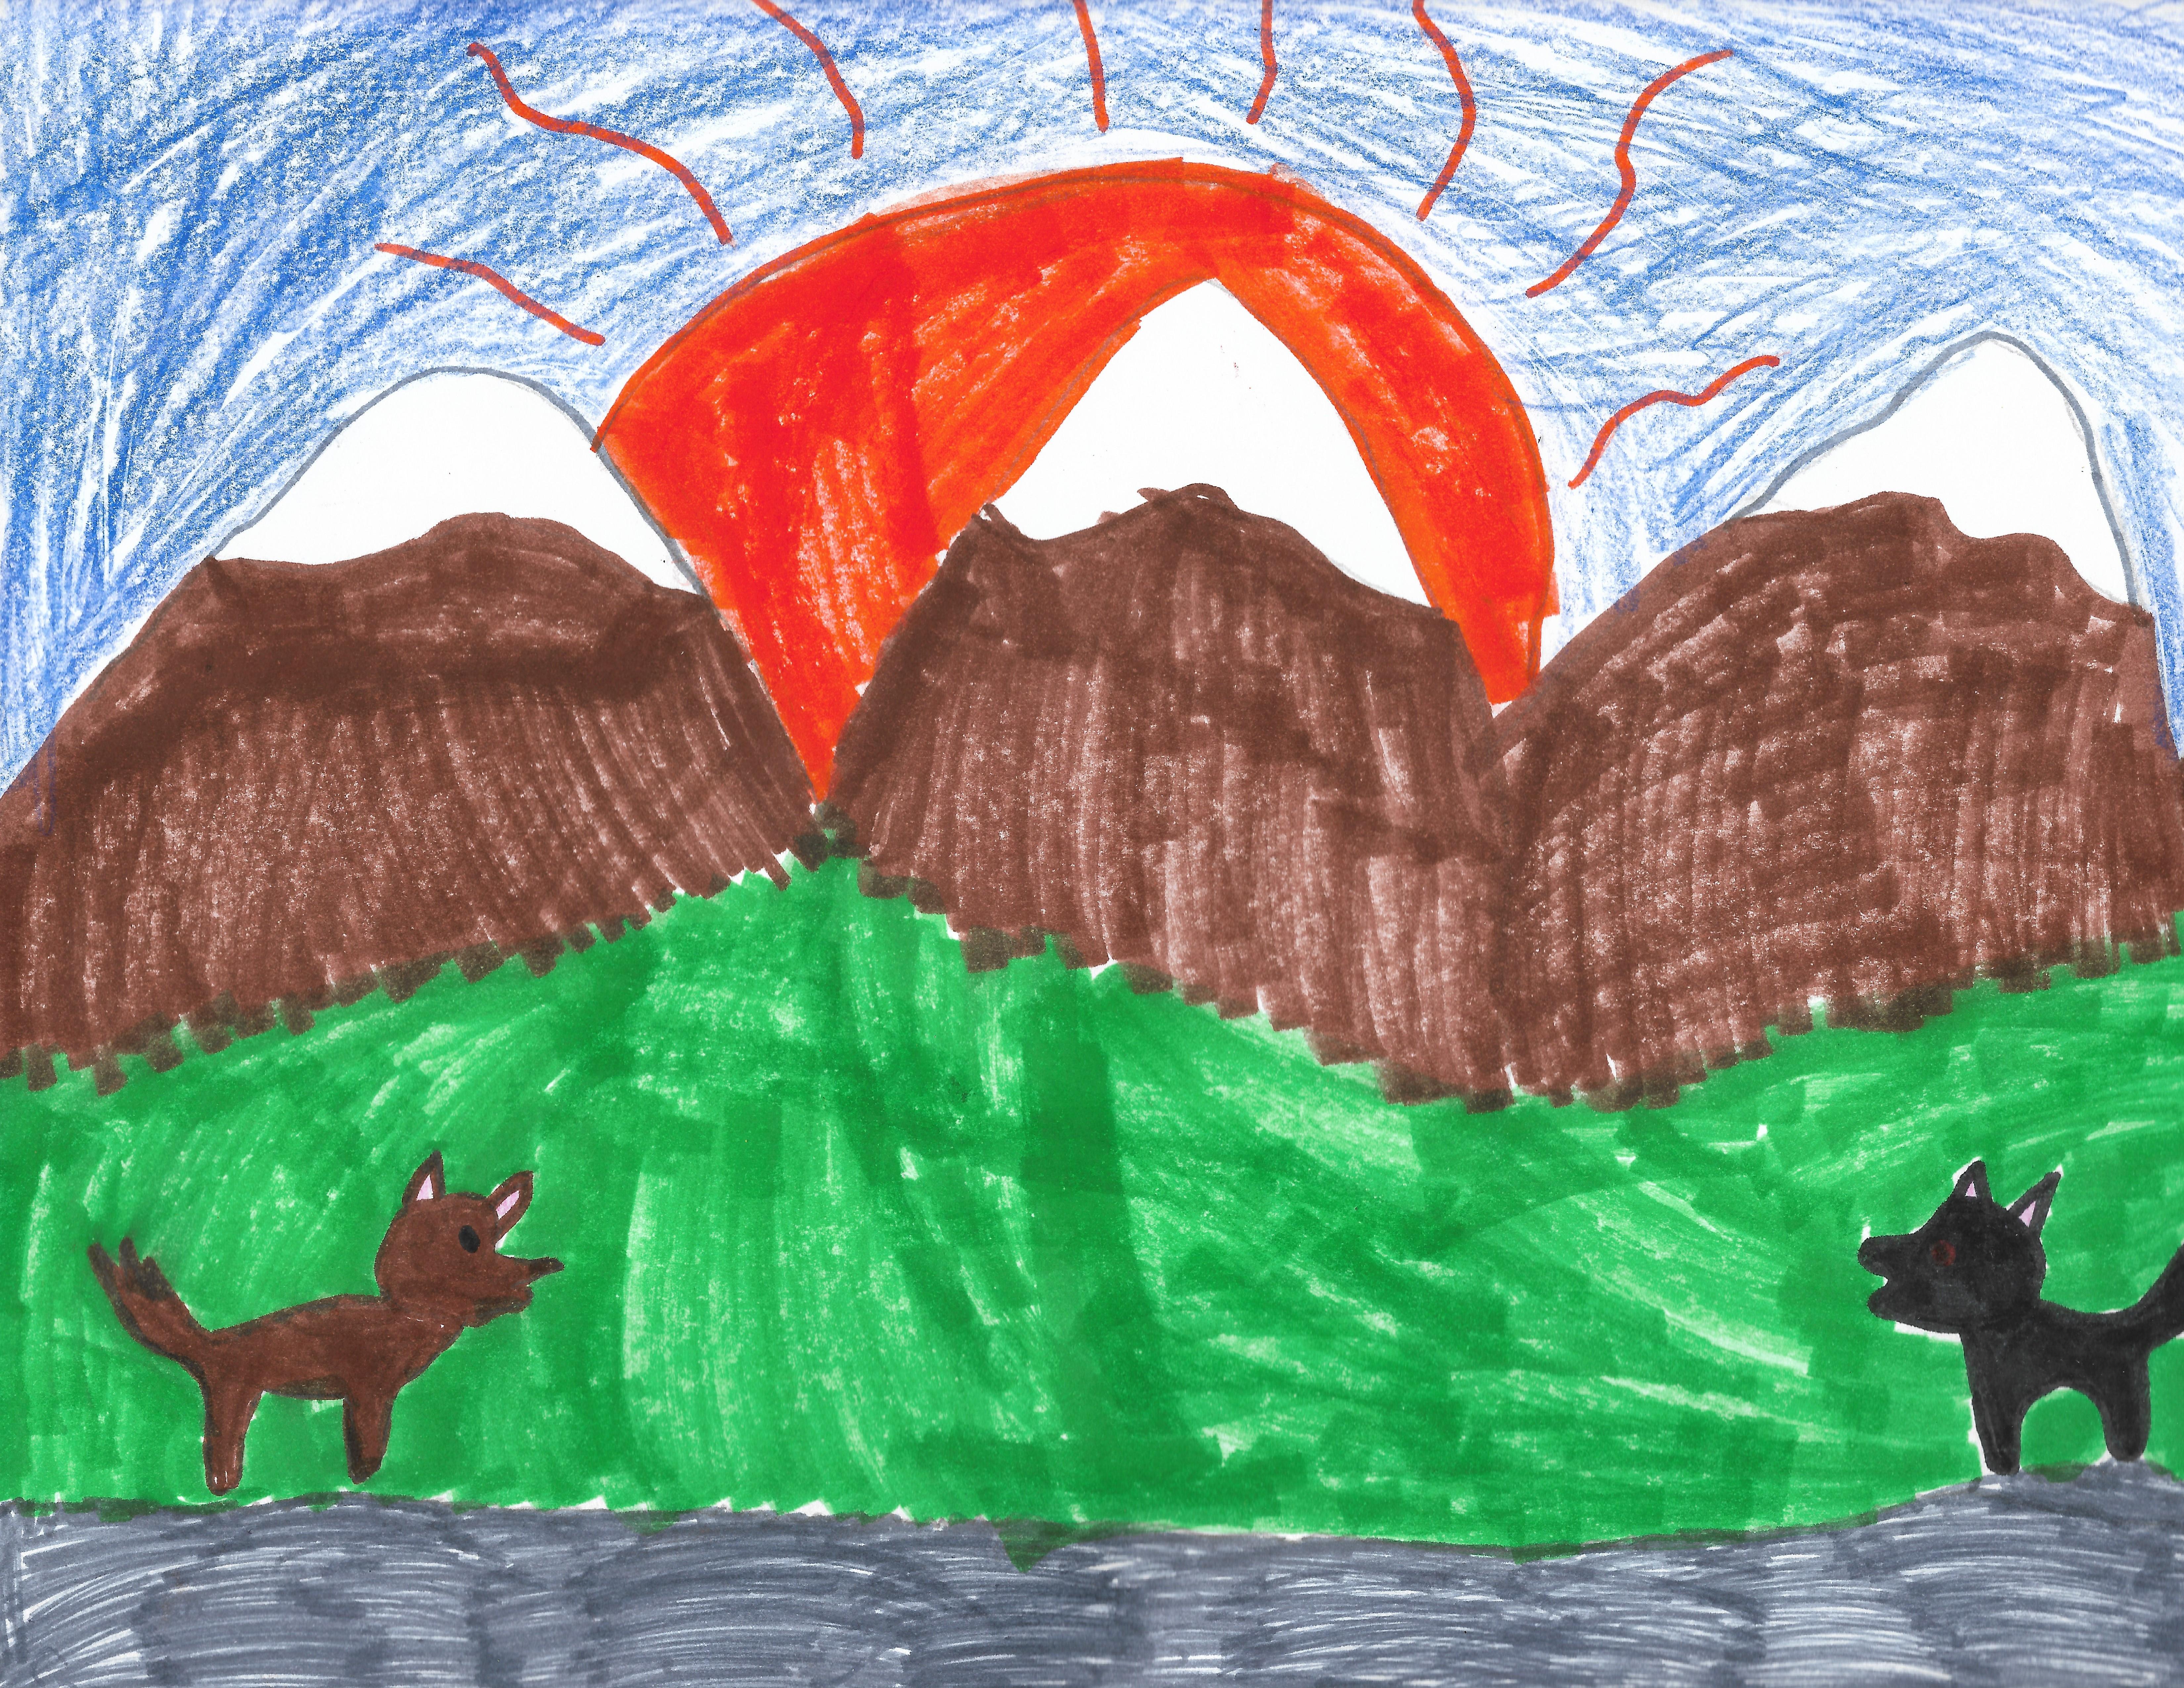 Siena H. - 3rd grade artist   Carl Cozier Elementary in Bellingham, Washington